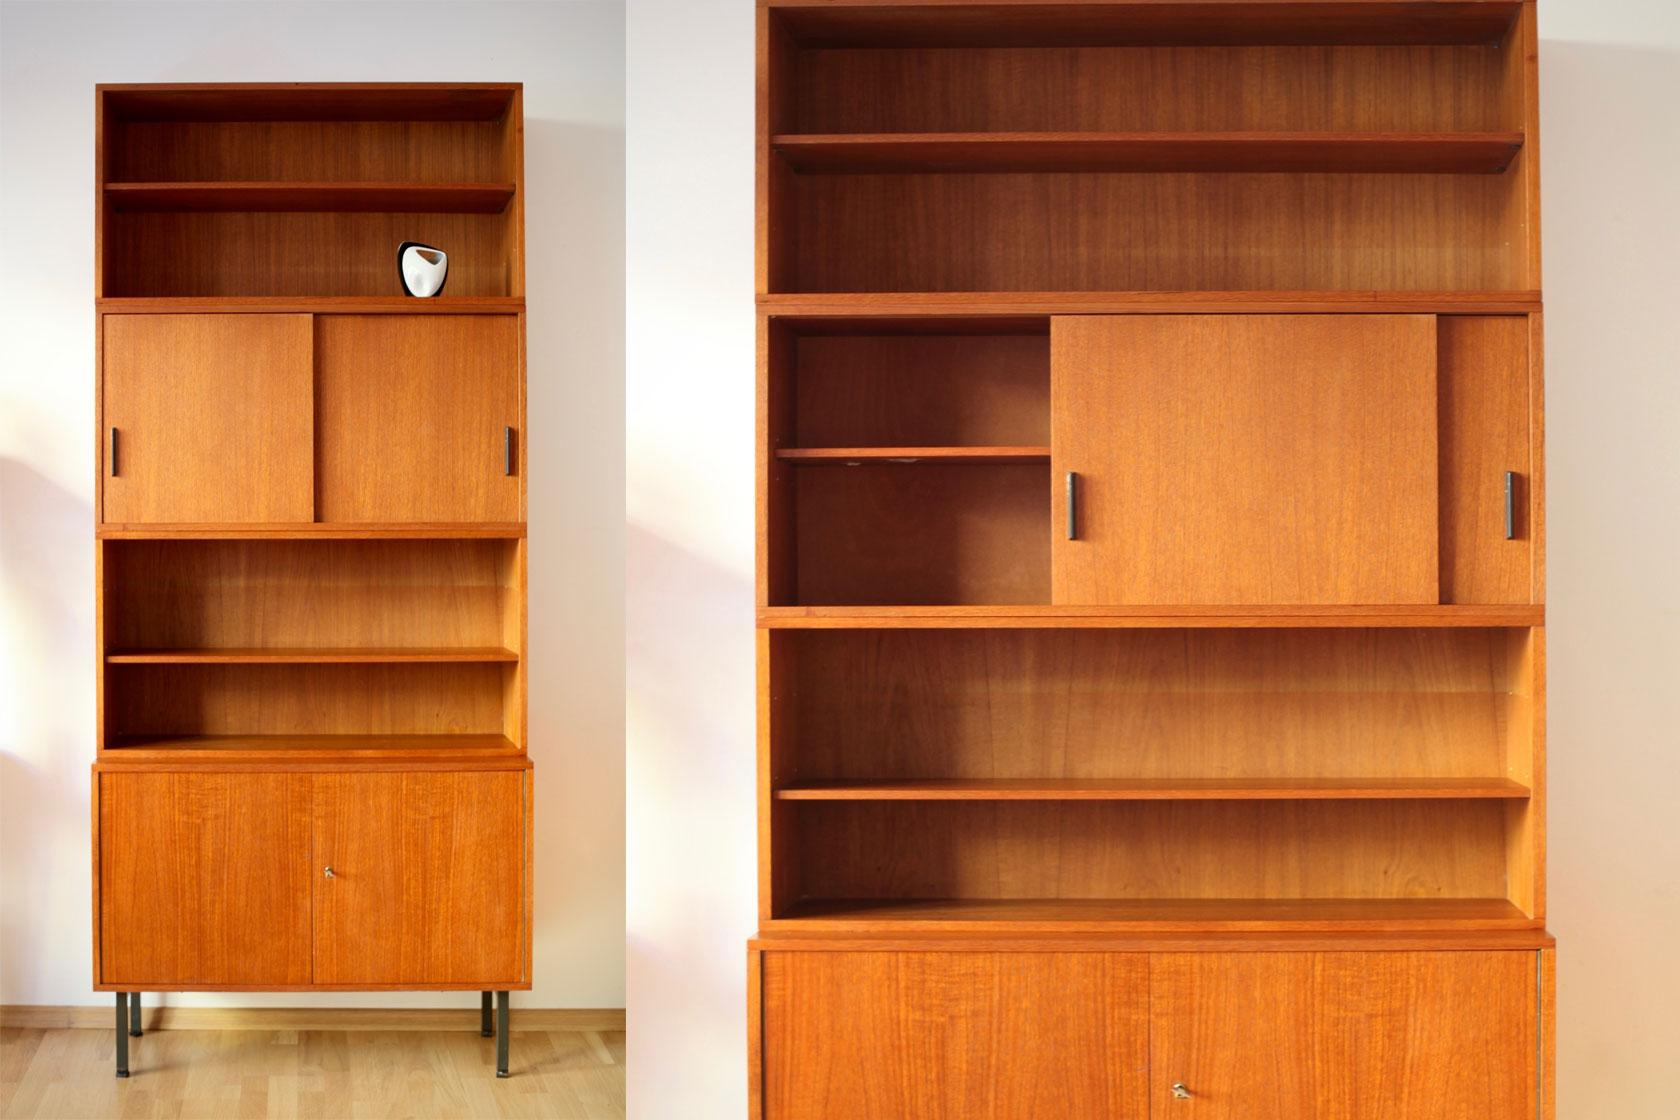 standregal 50er jahre in teakfurnier raumwunder vintage wohnen in n rnberg. Black Bedroom Furniture Sets. Home Design Ideas